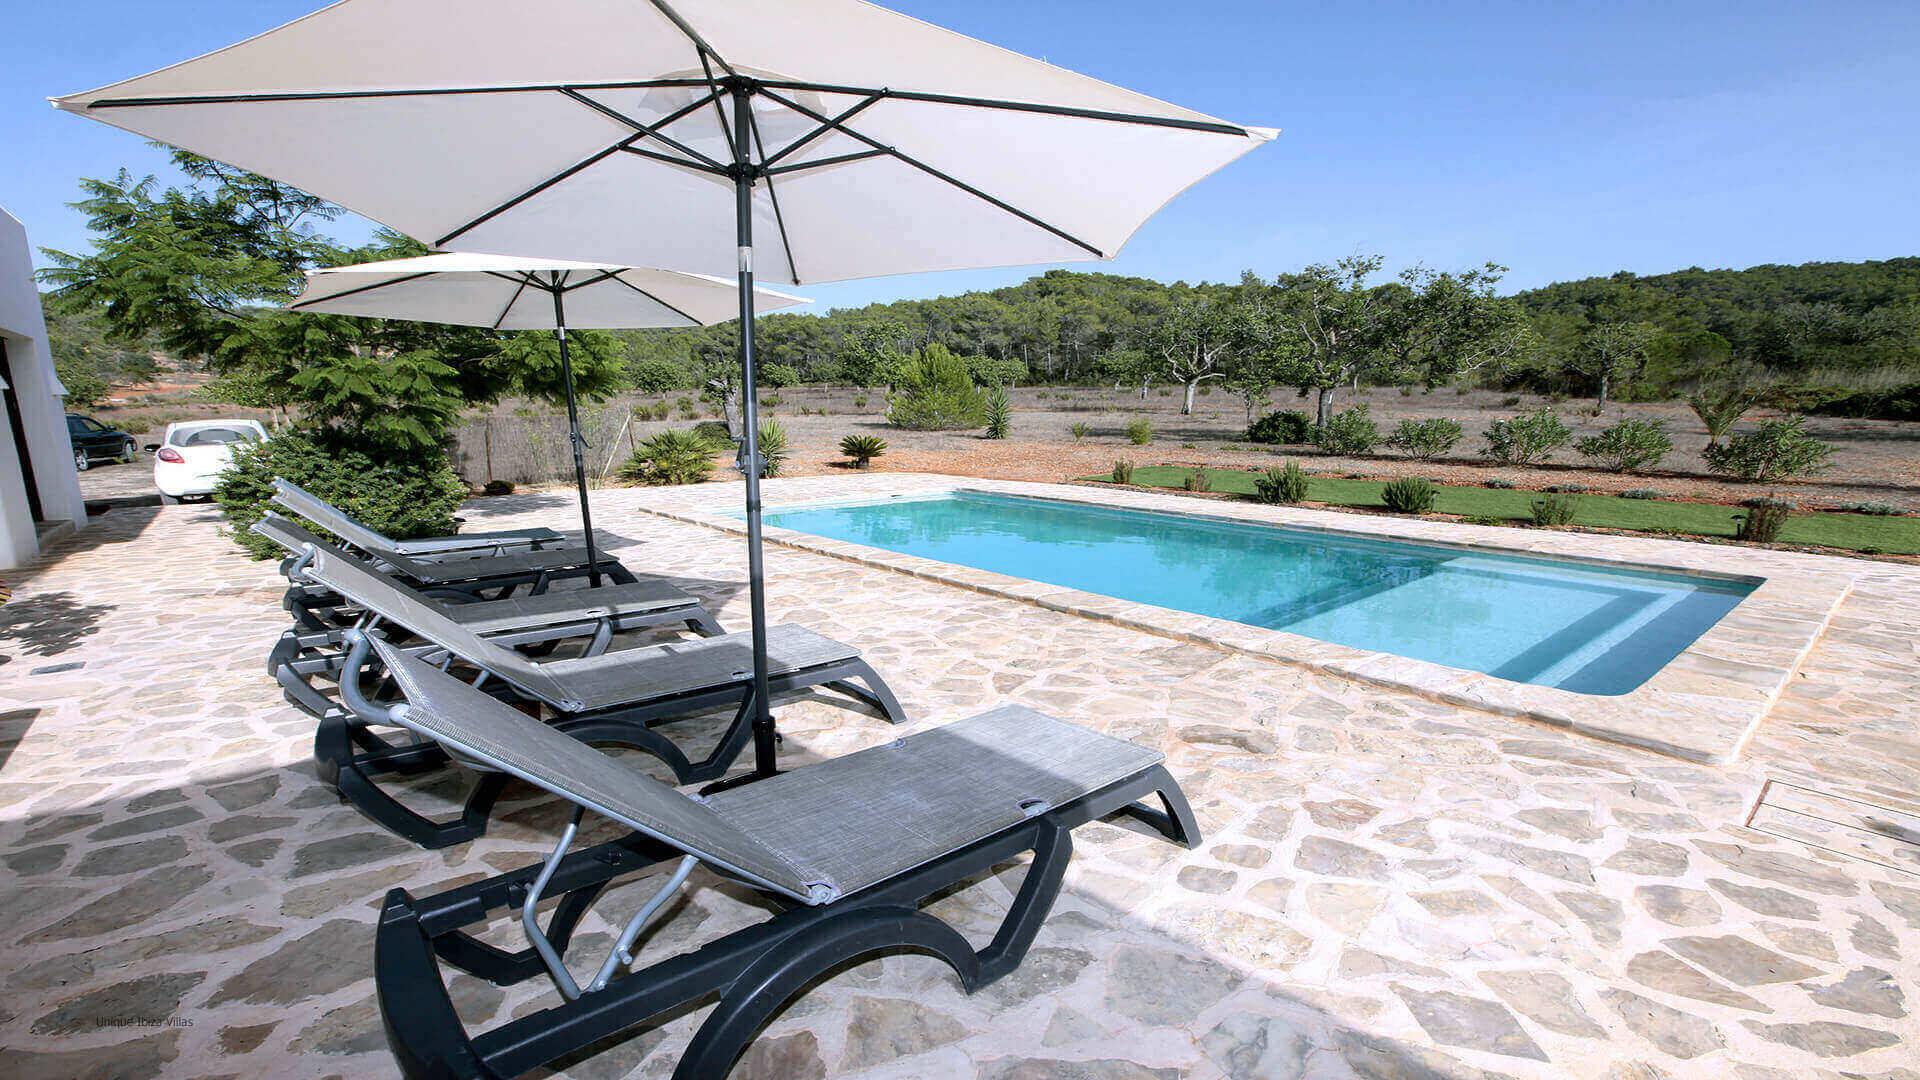 Cana Marieta Ibiza Villa 4 Near San Miguel